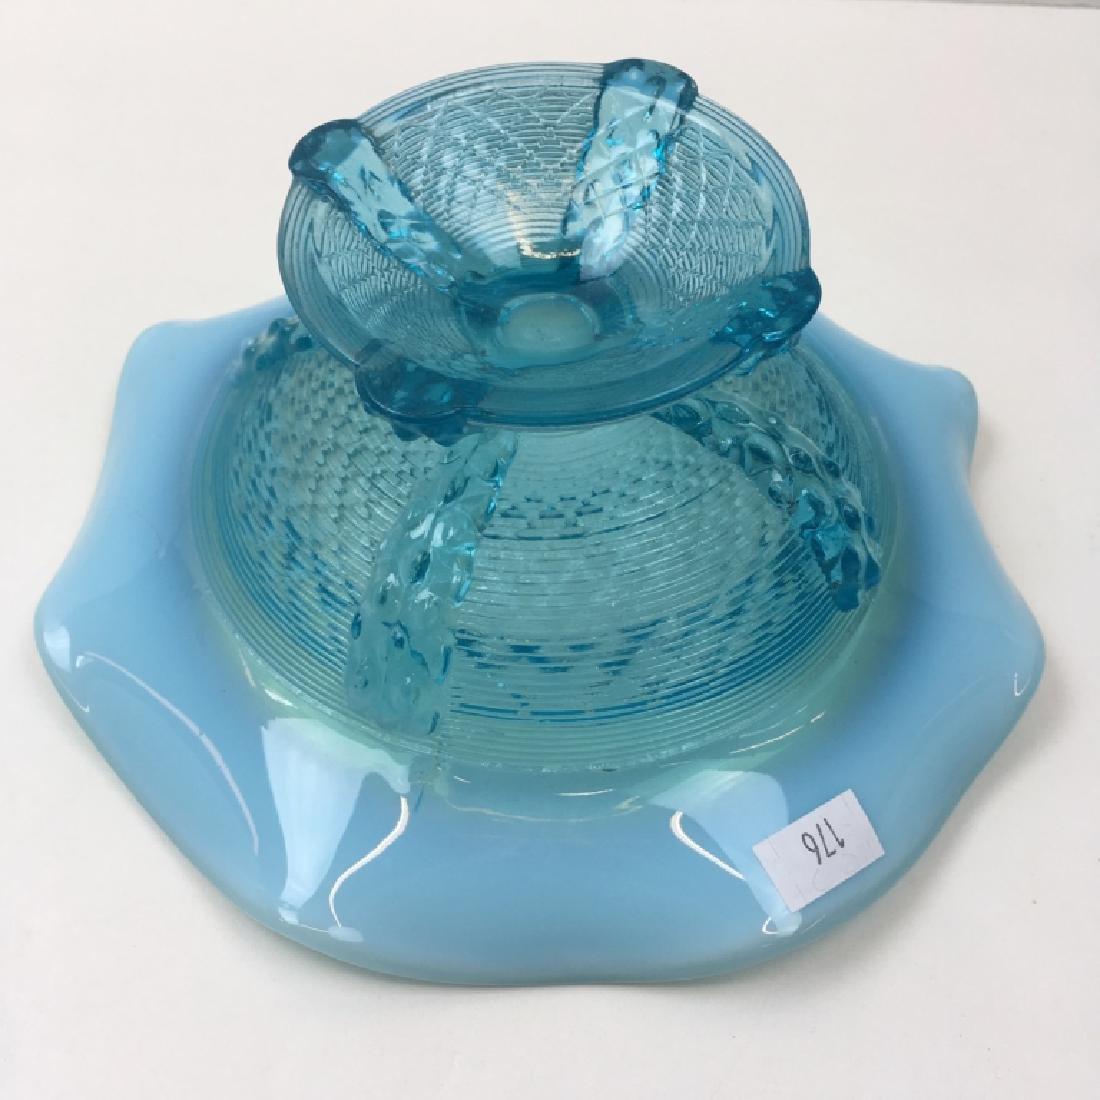 5 PCS OF VINTAGE BLUE OPALESCENT & SATIN GLASS - 12